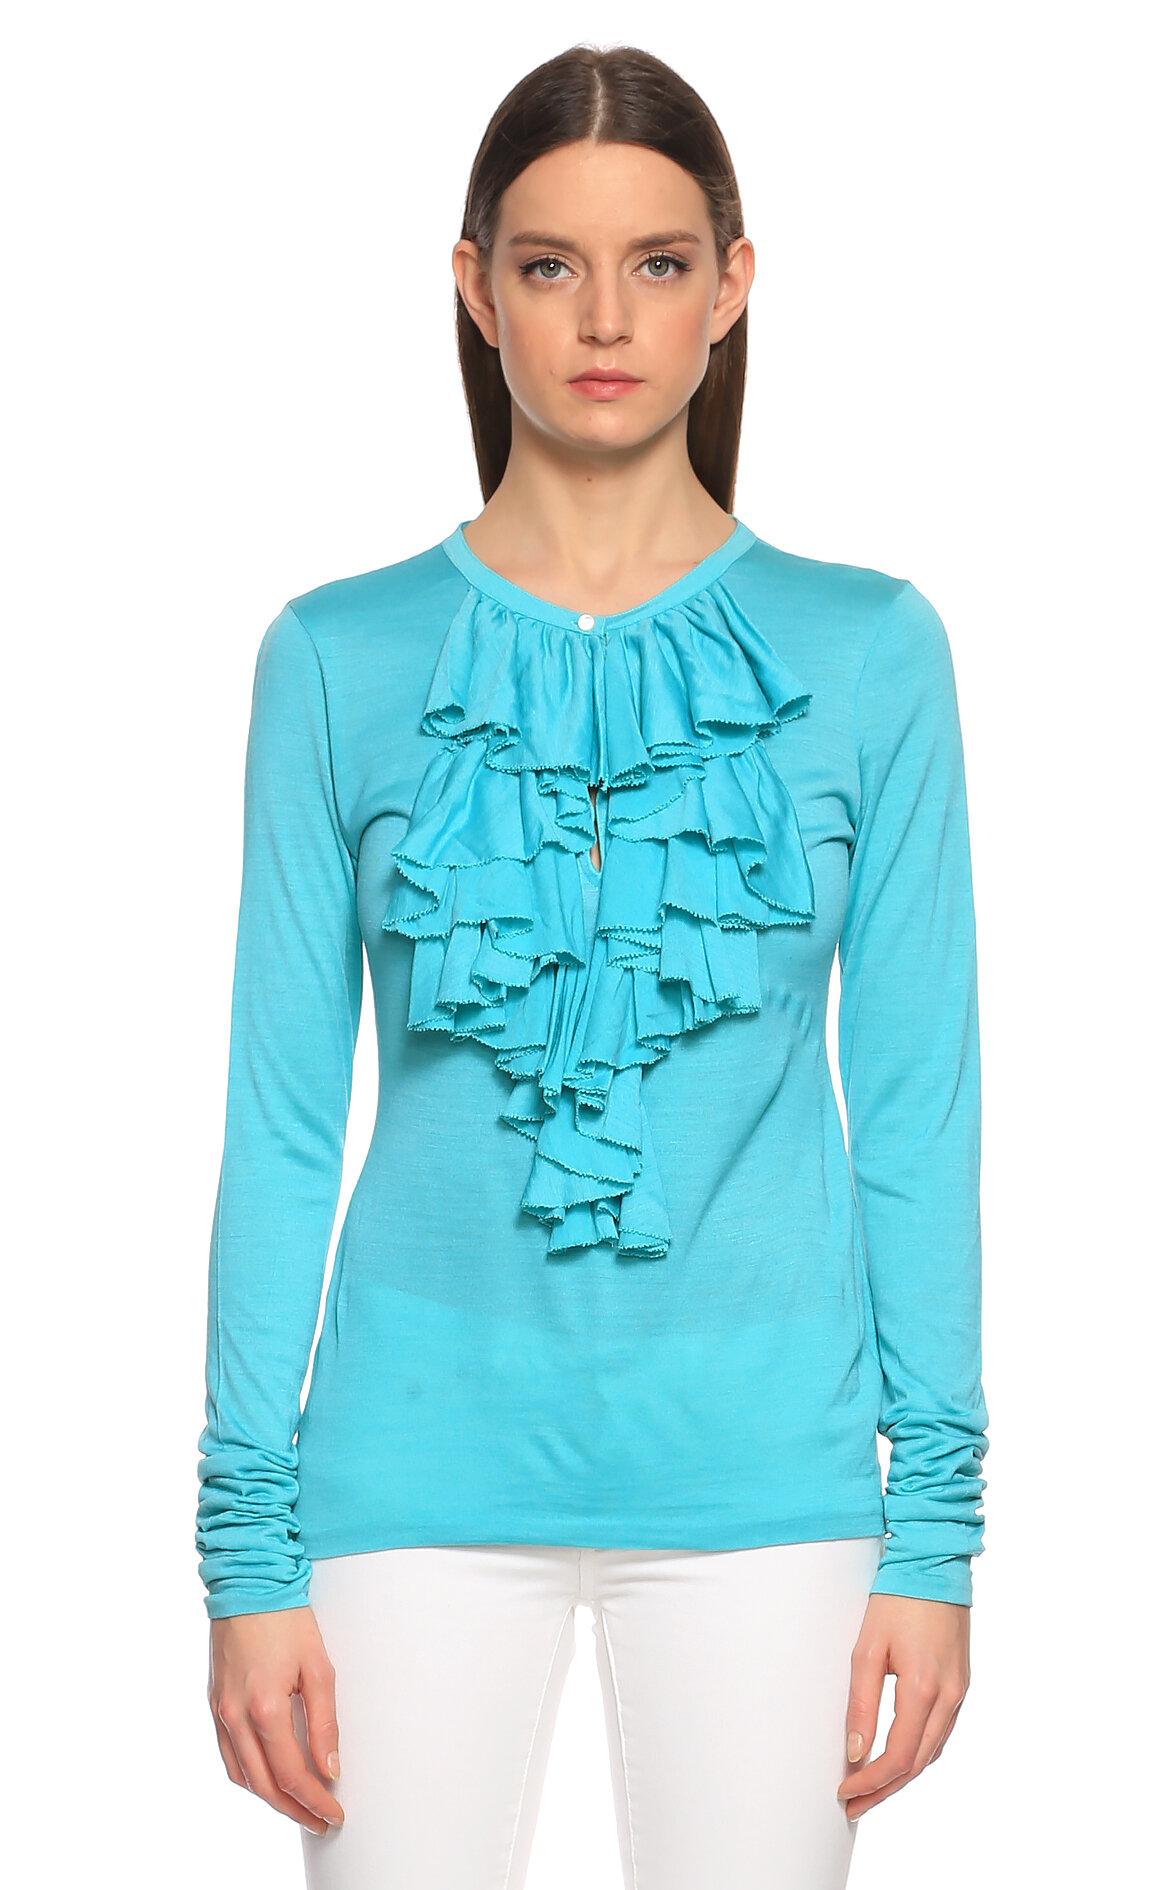 Ralph Lauren Blue Label-Ralph Lauren Blue Label Yeşil Polo T-Shirt